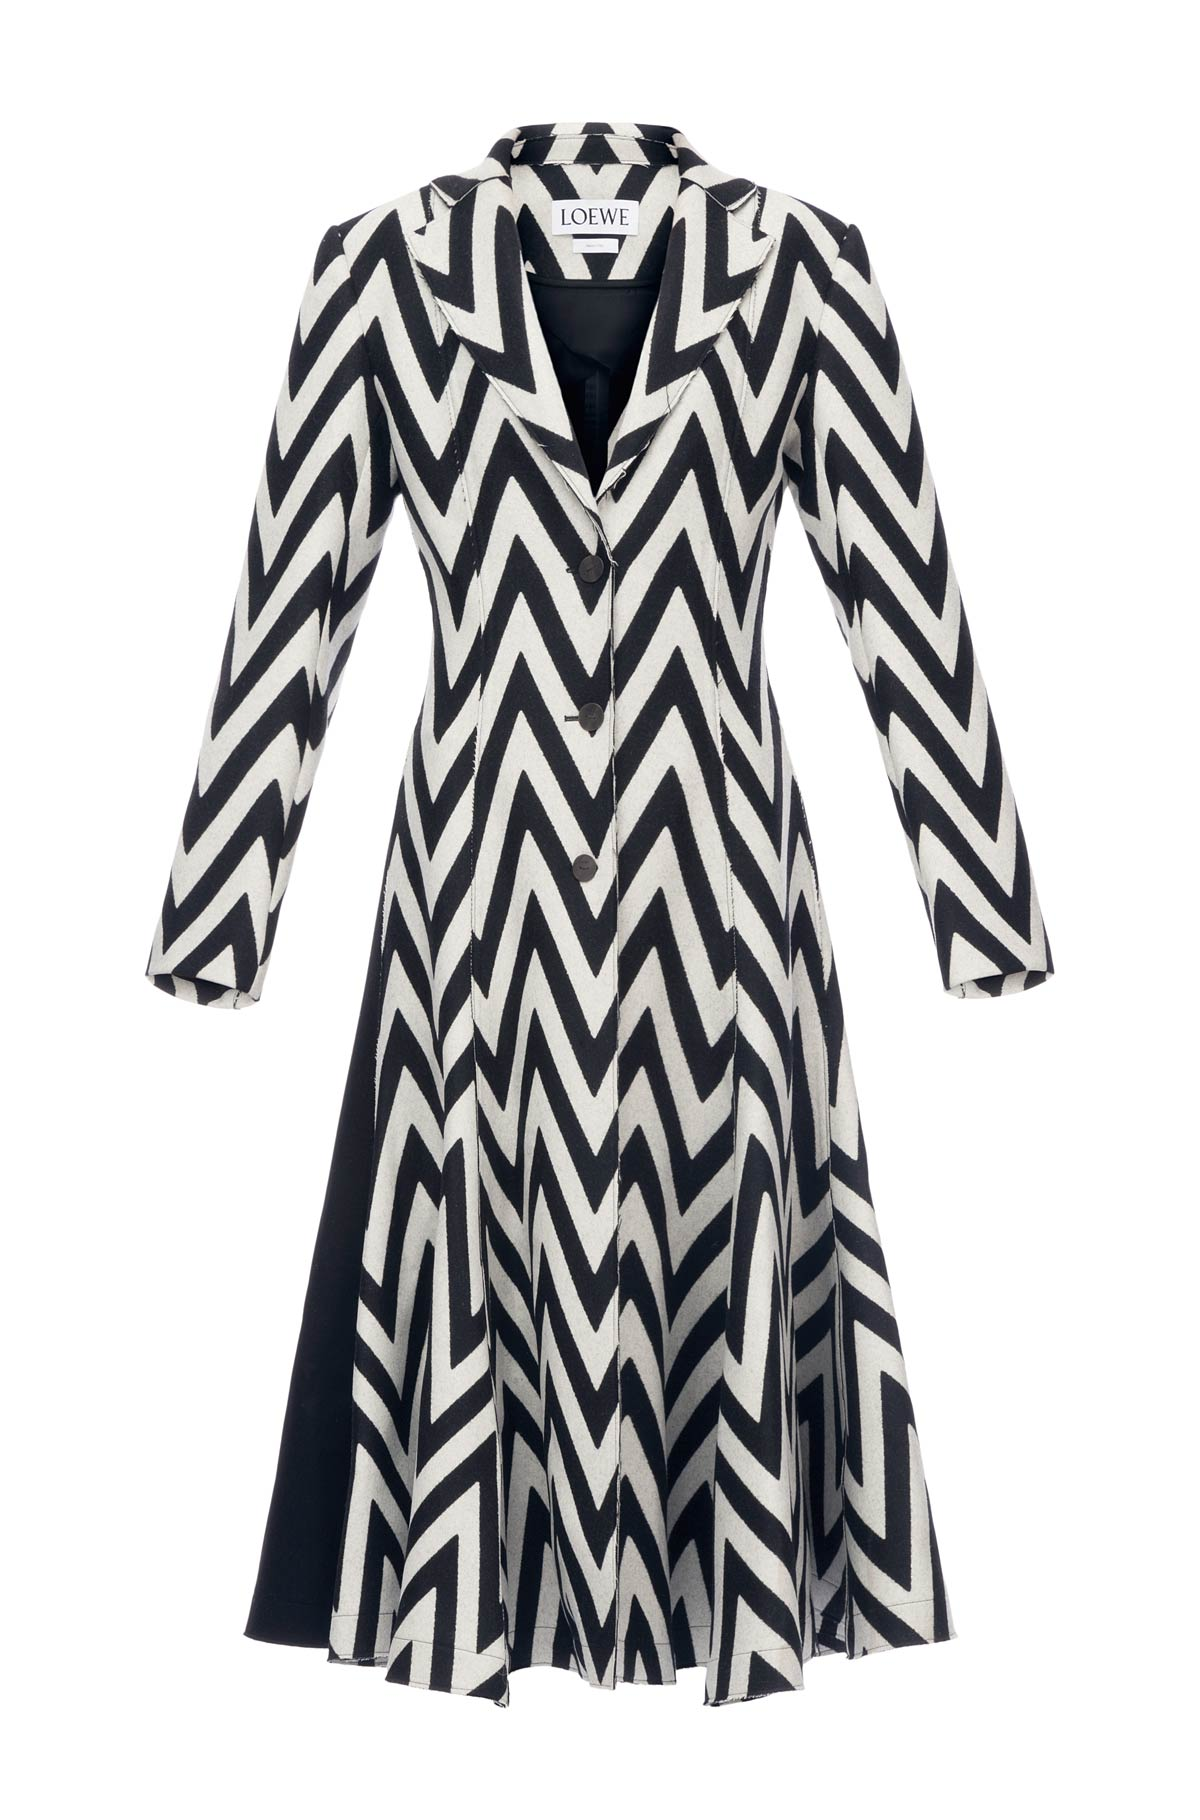 LOEWE Herringbone Wool Coat Negro/Blanco front